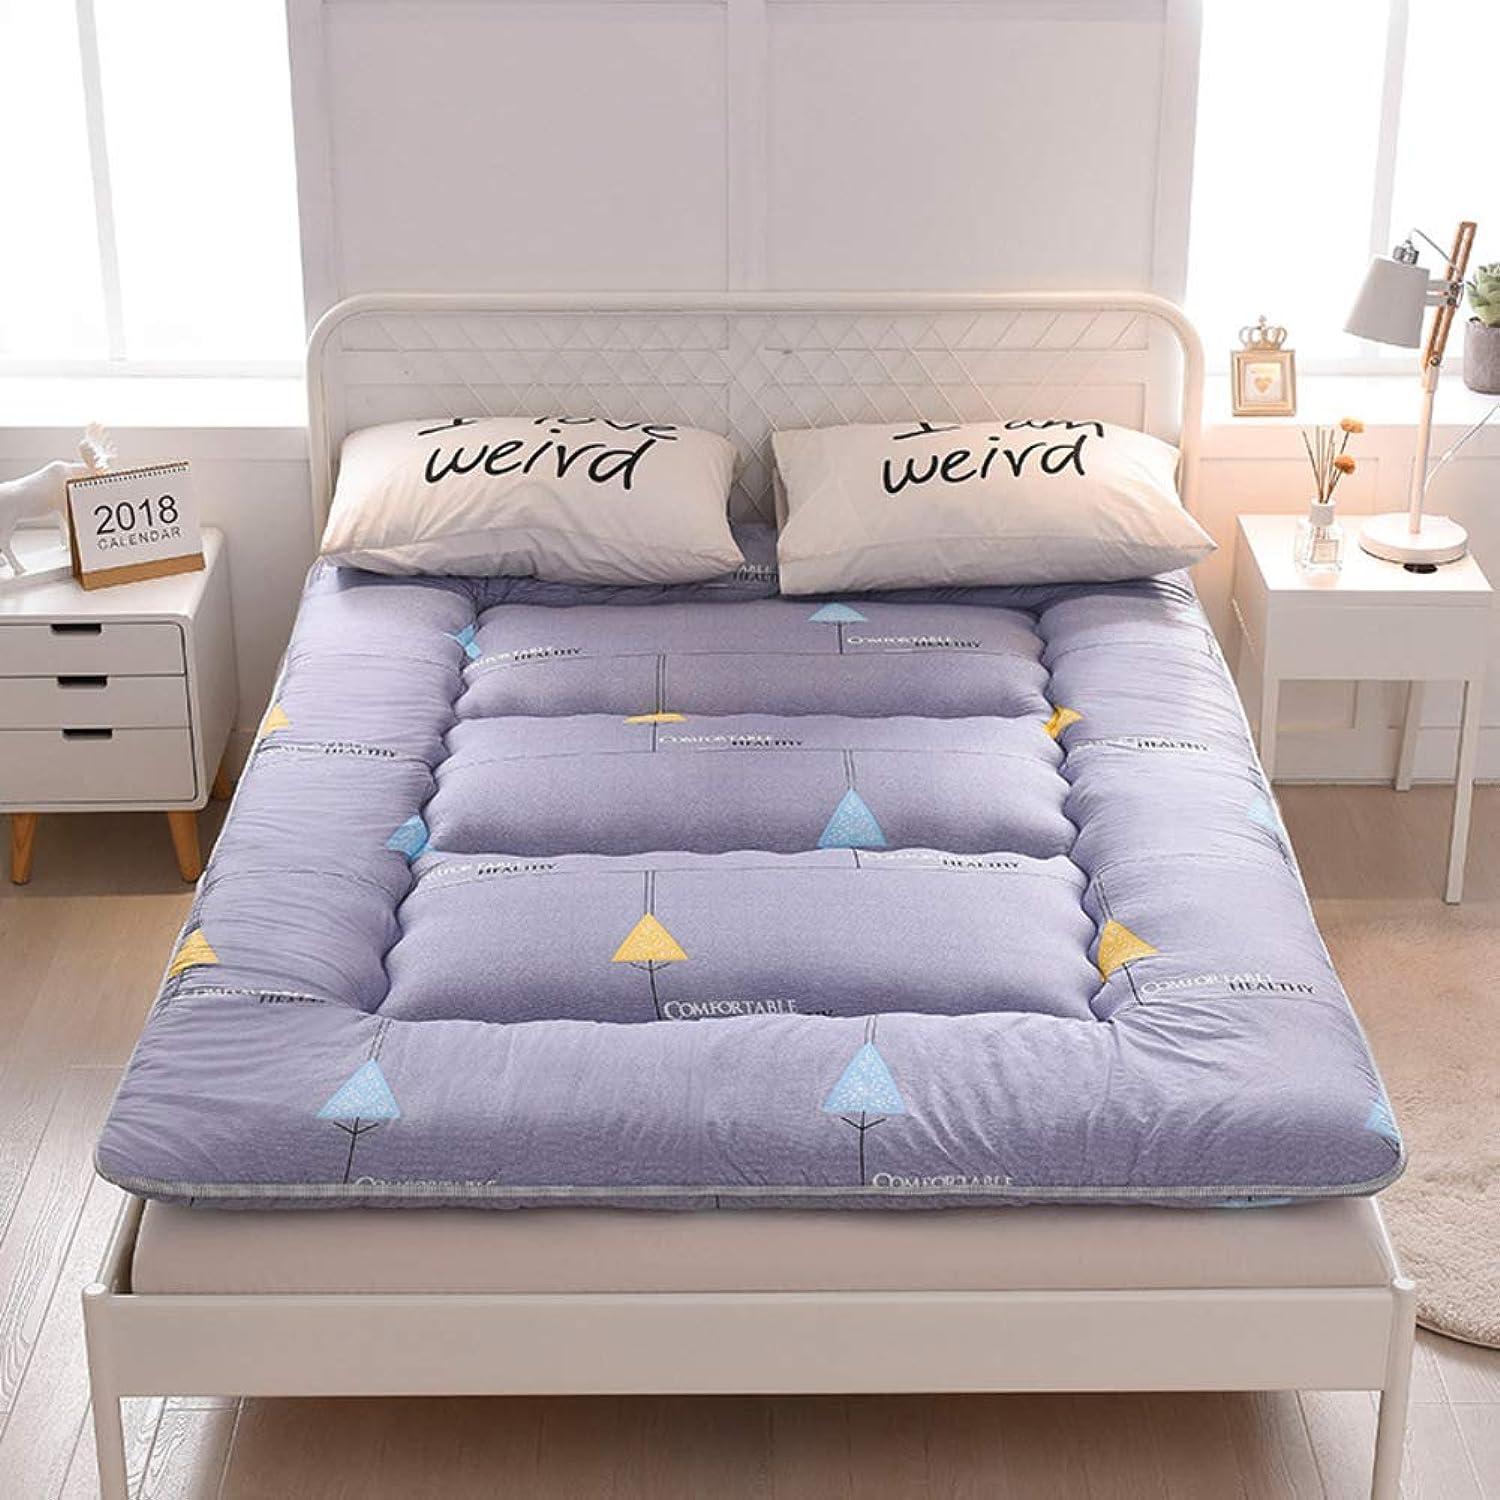 QWERTYUI Folding Tatami Floor mat, Thickened Ground Floor Sleeping pad Tatami mats Mattress Mattress Topper-H 90x200cm(35x79inch)